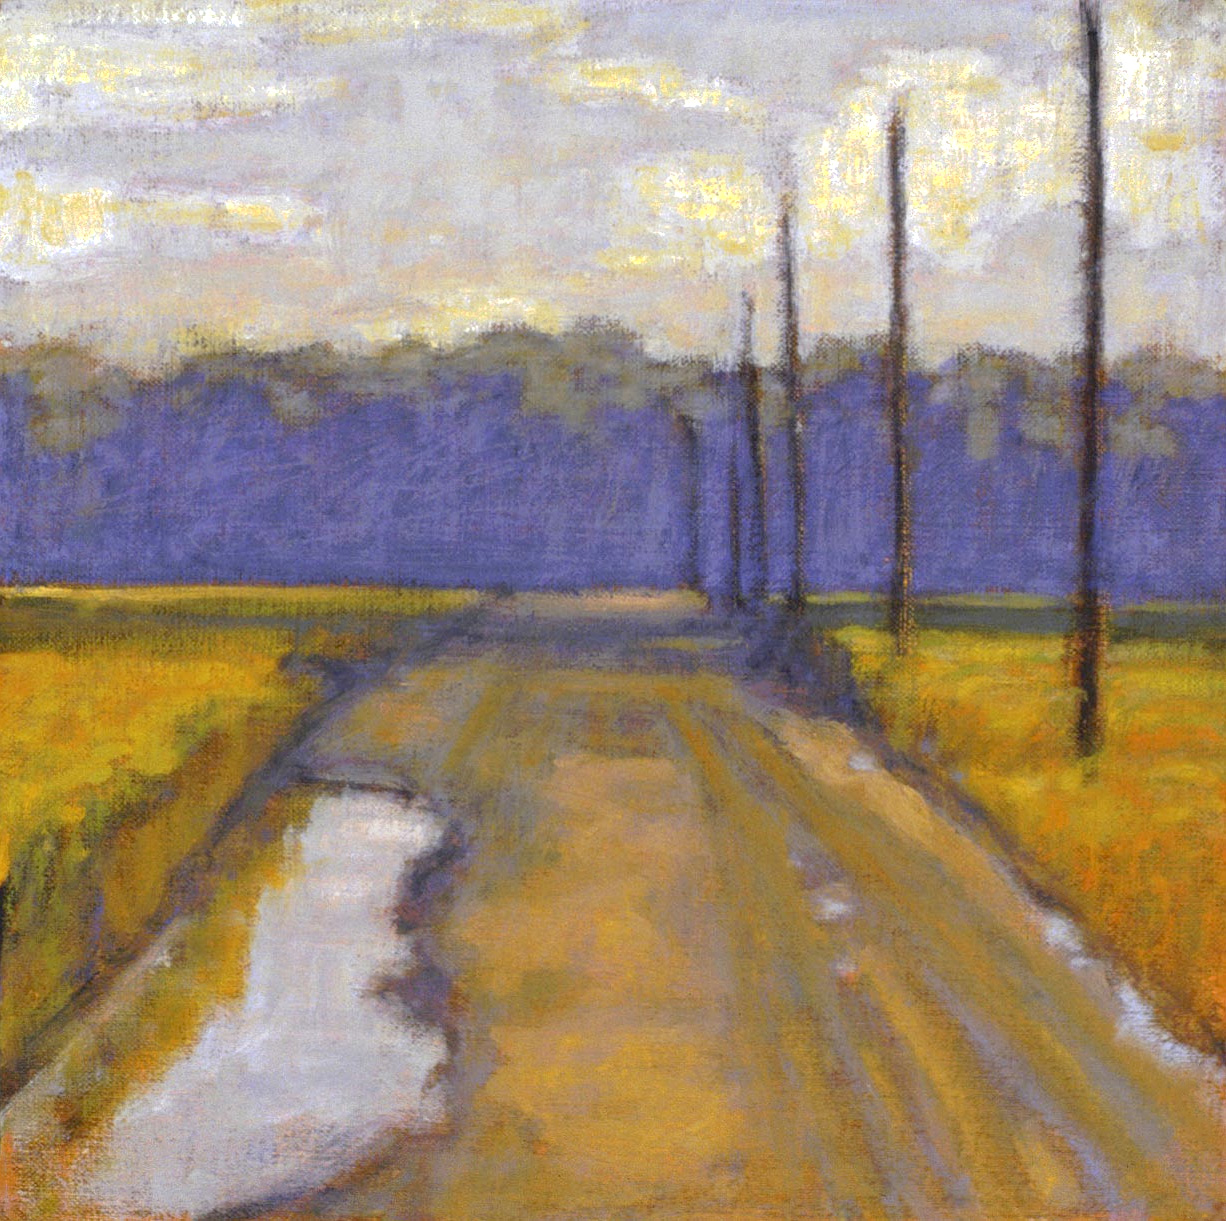 "New Harmony, IN   | oil on linen | 12 x 14"" | 2003"